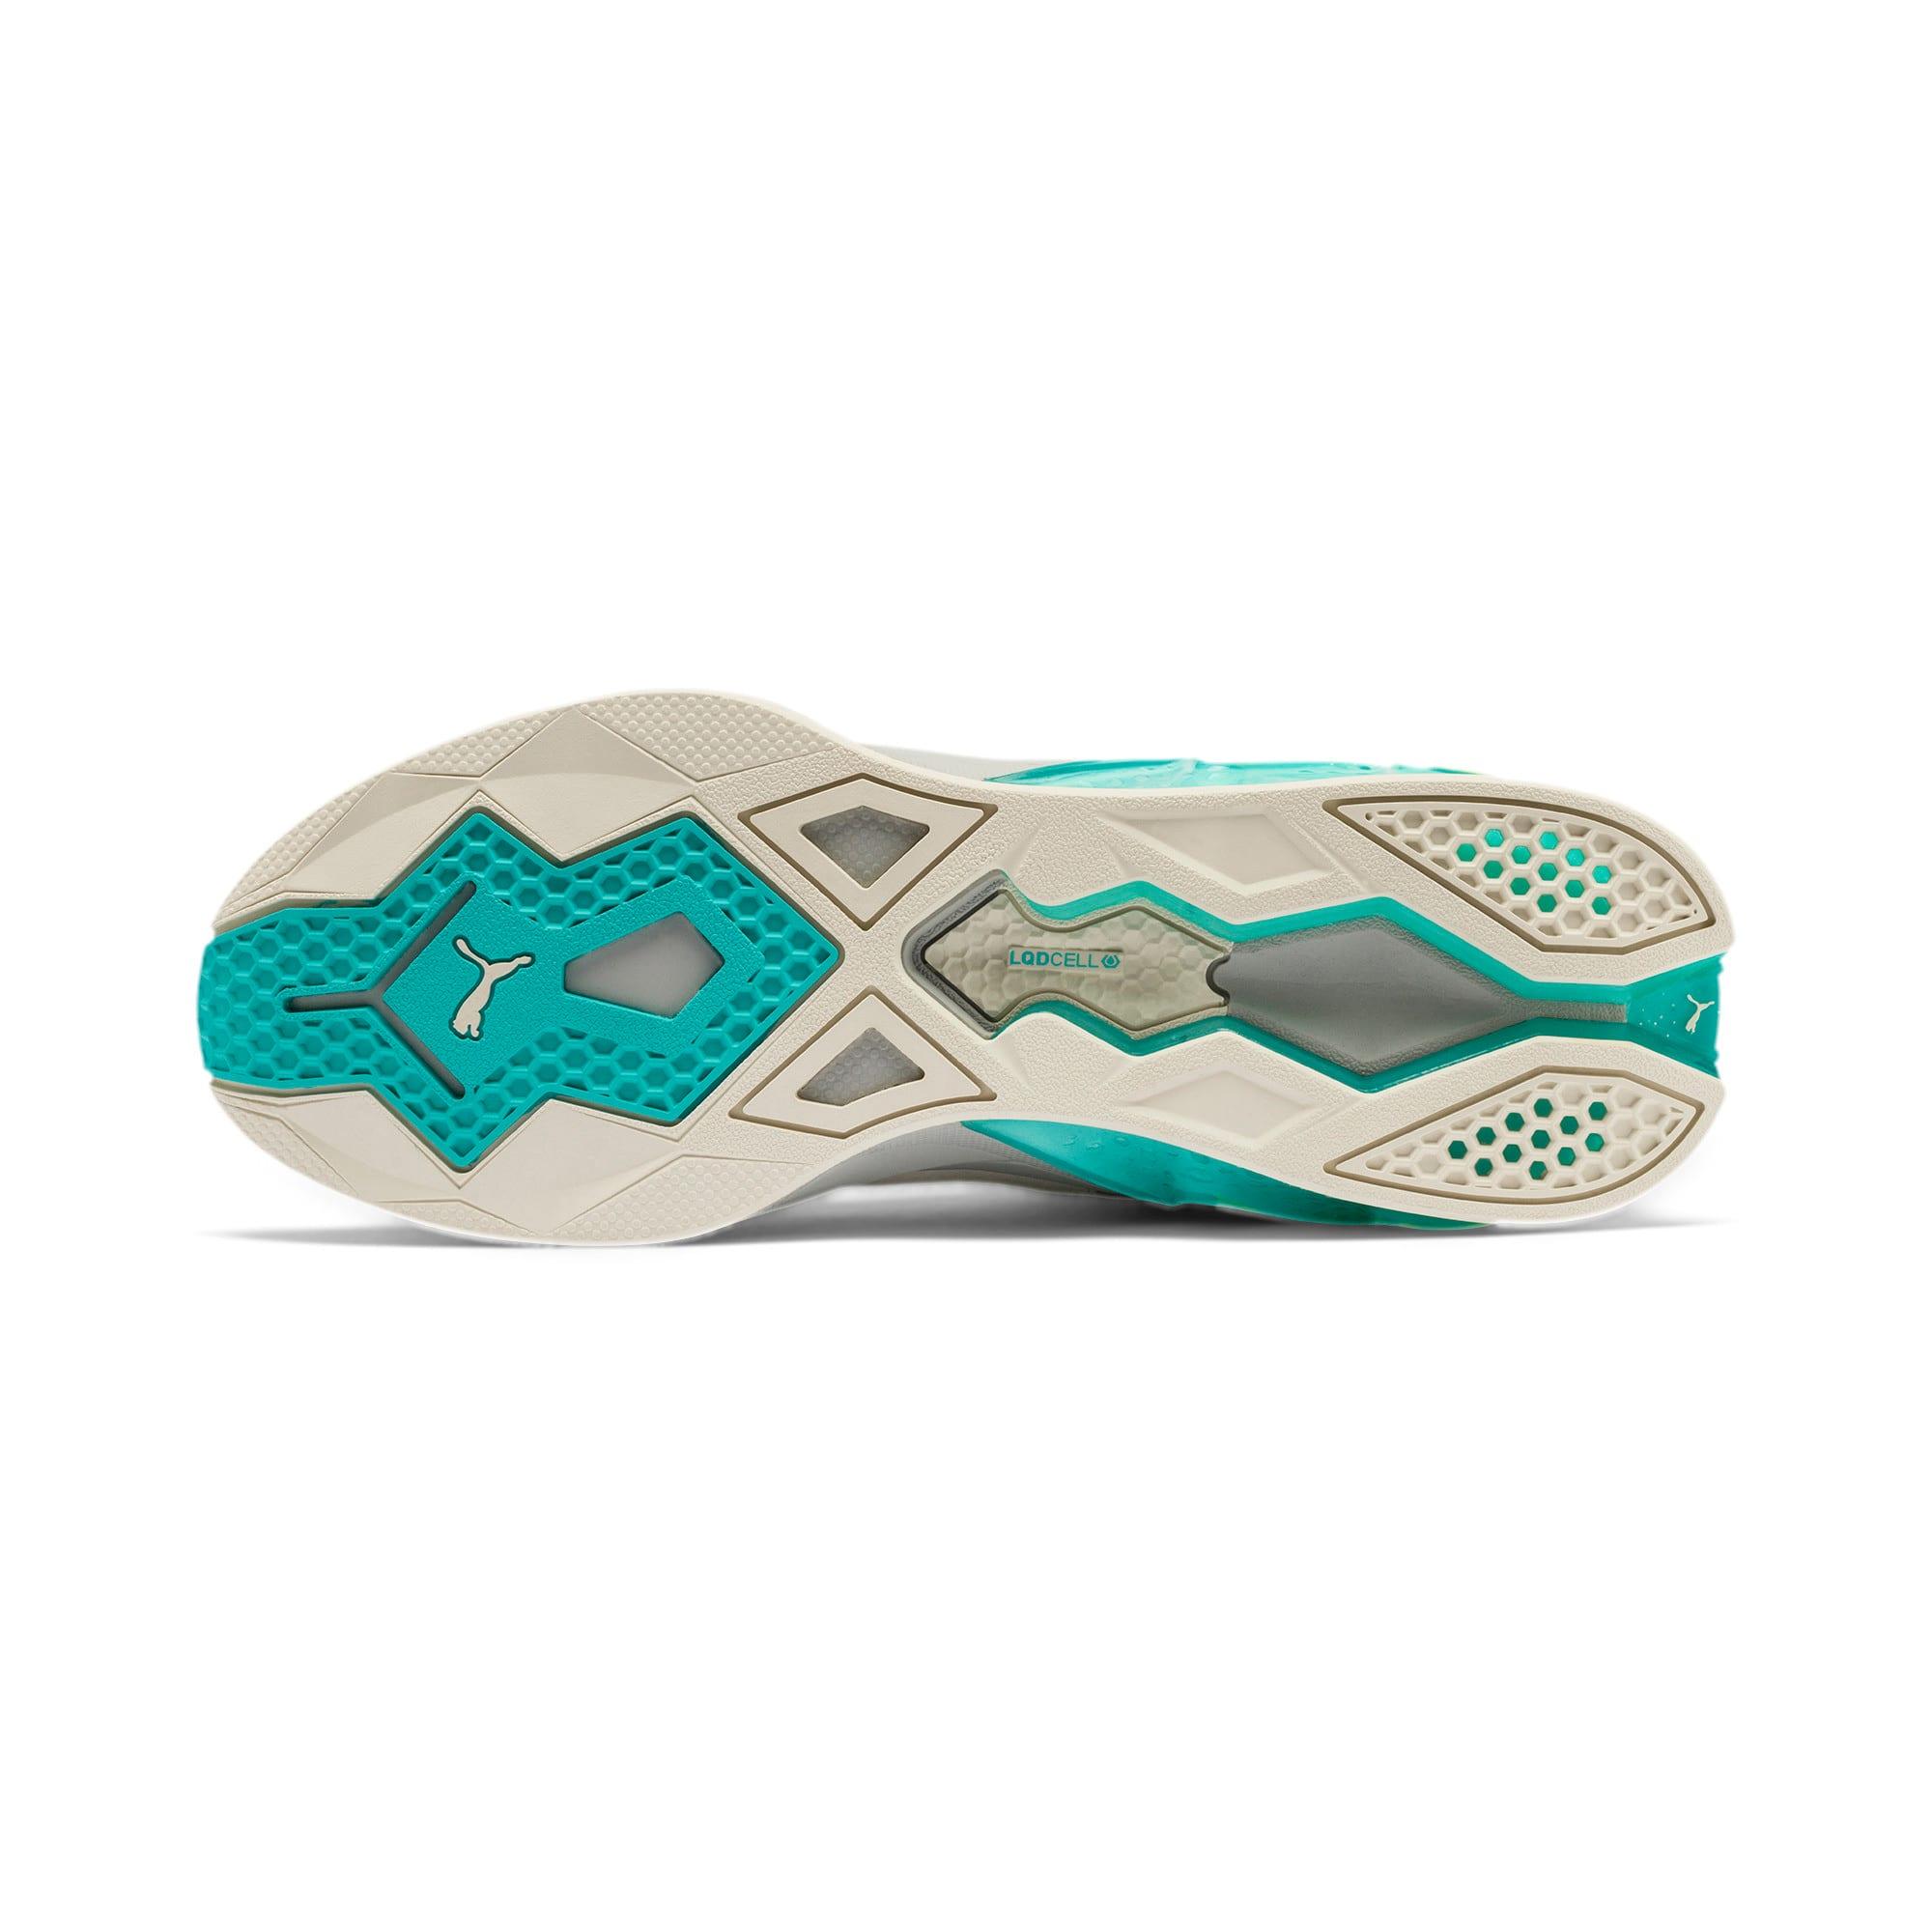 Thumbnail 5 of LQDCELL Origin Men's Training Shoes, High Rise-Blue Turquoise, medium